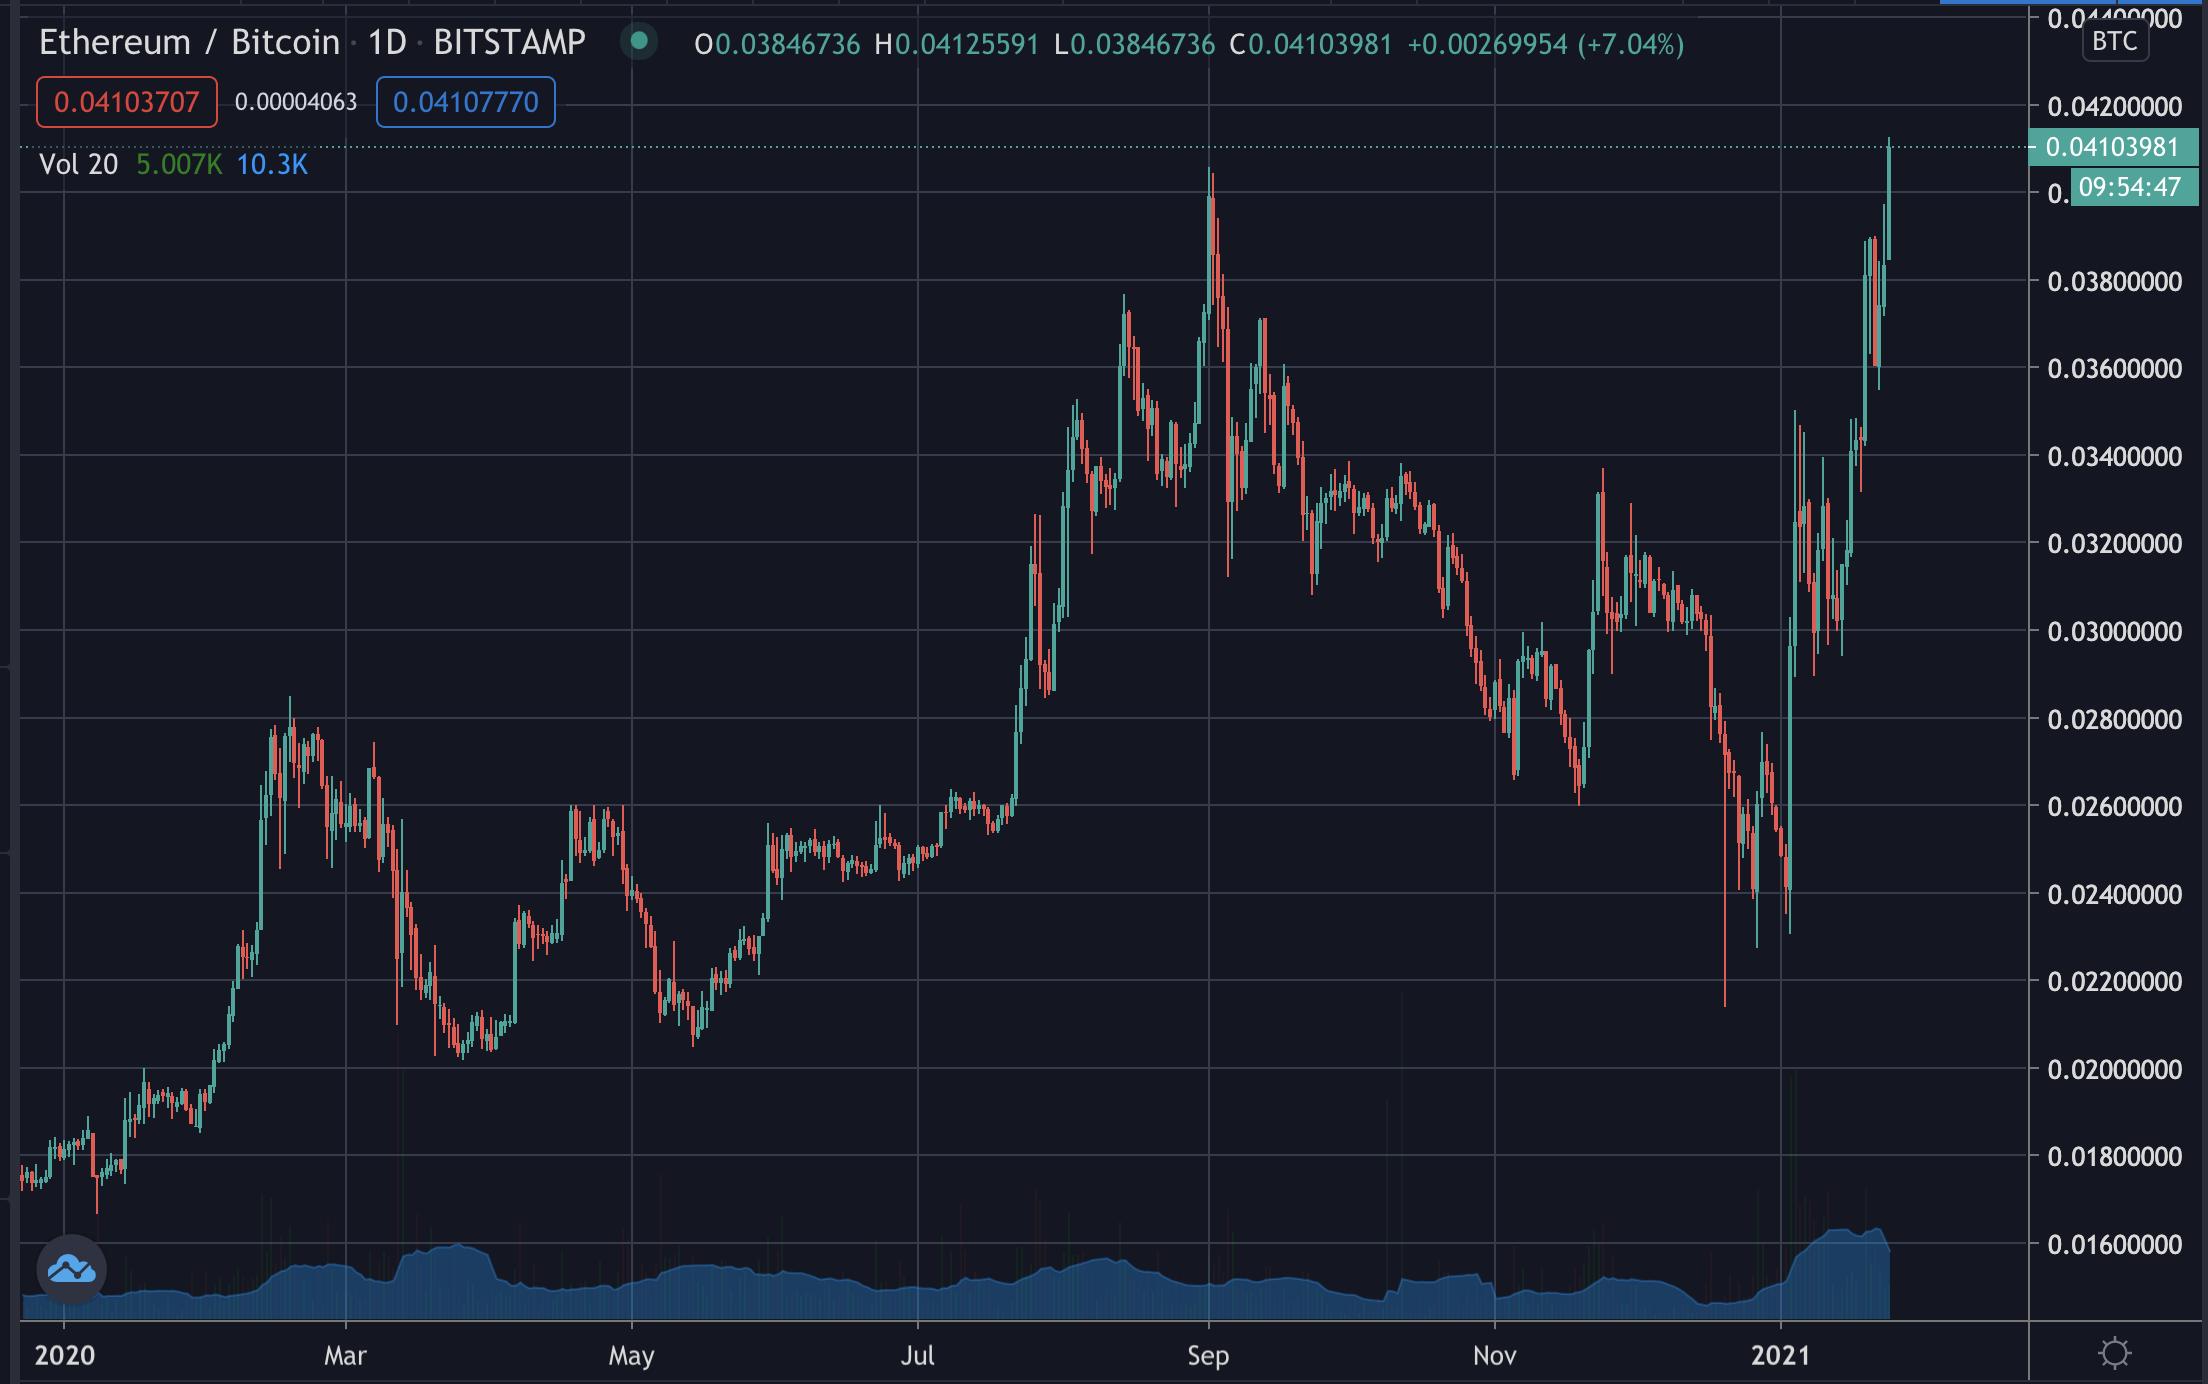 ETH/BTC price, Jan 2021